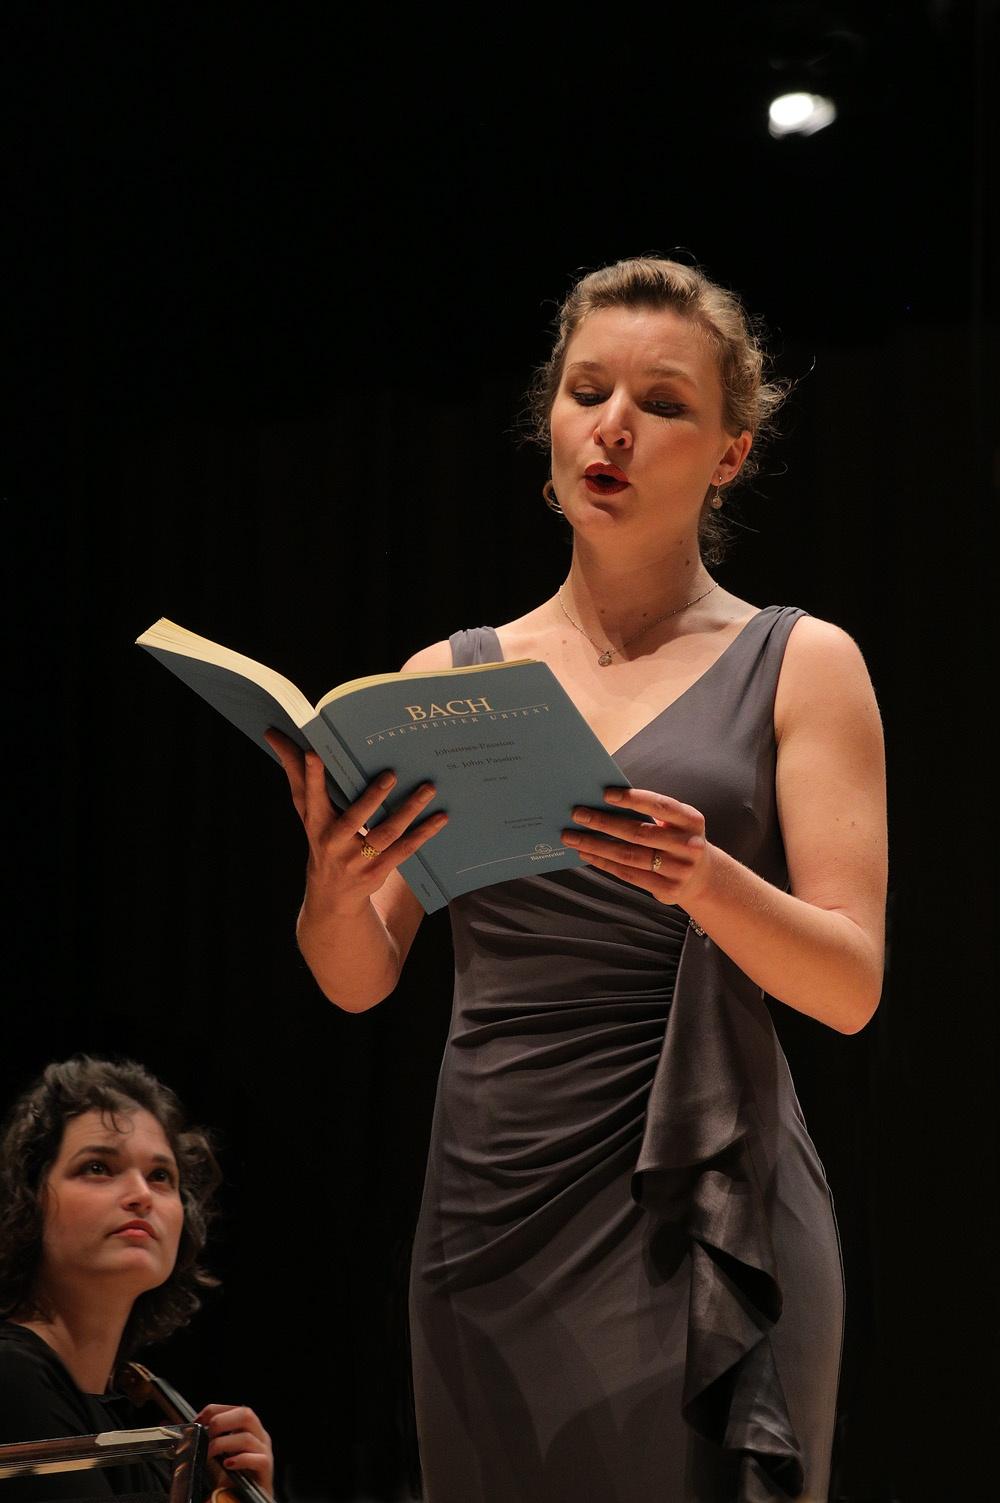 danielleB Danielle Reutter-Hurrah,  Mezzo-soprano,  Berkeley, California, 2015